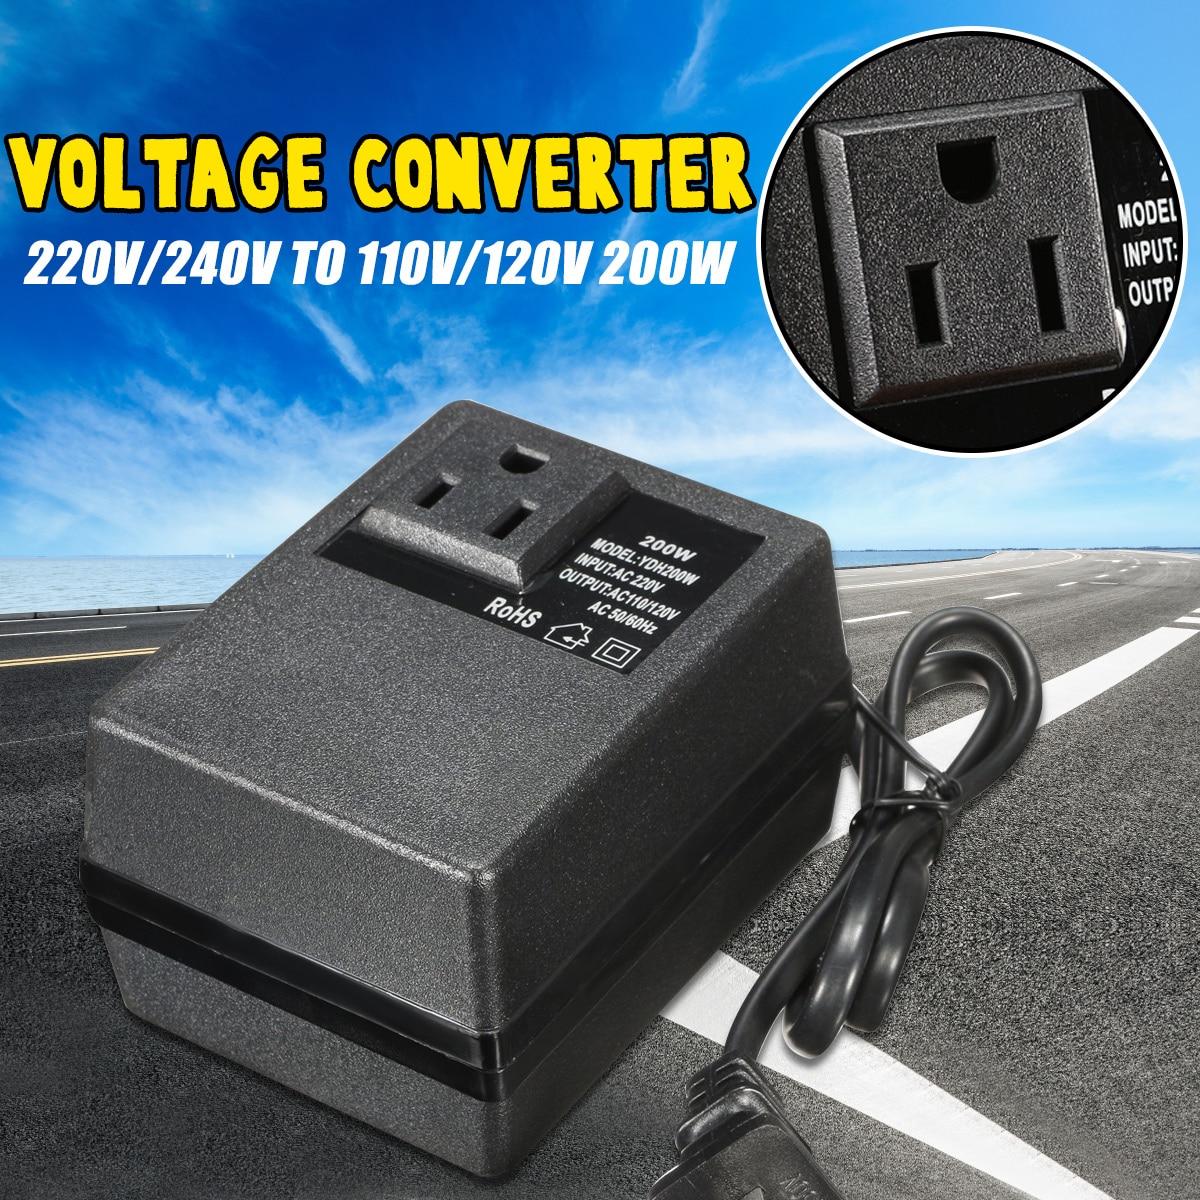 220V 240V to 110V 120V 200W Electronic International Travel Power Converter  Voltage Converter Power Adapter|converter 110v 220v|power converter 110v 220v|110v 220v converter - title=